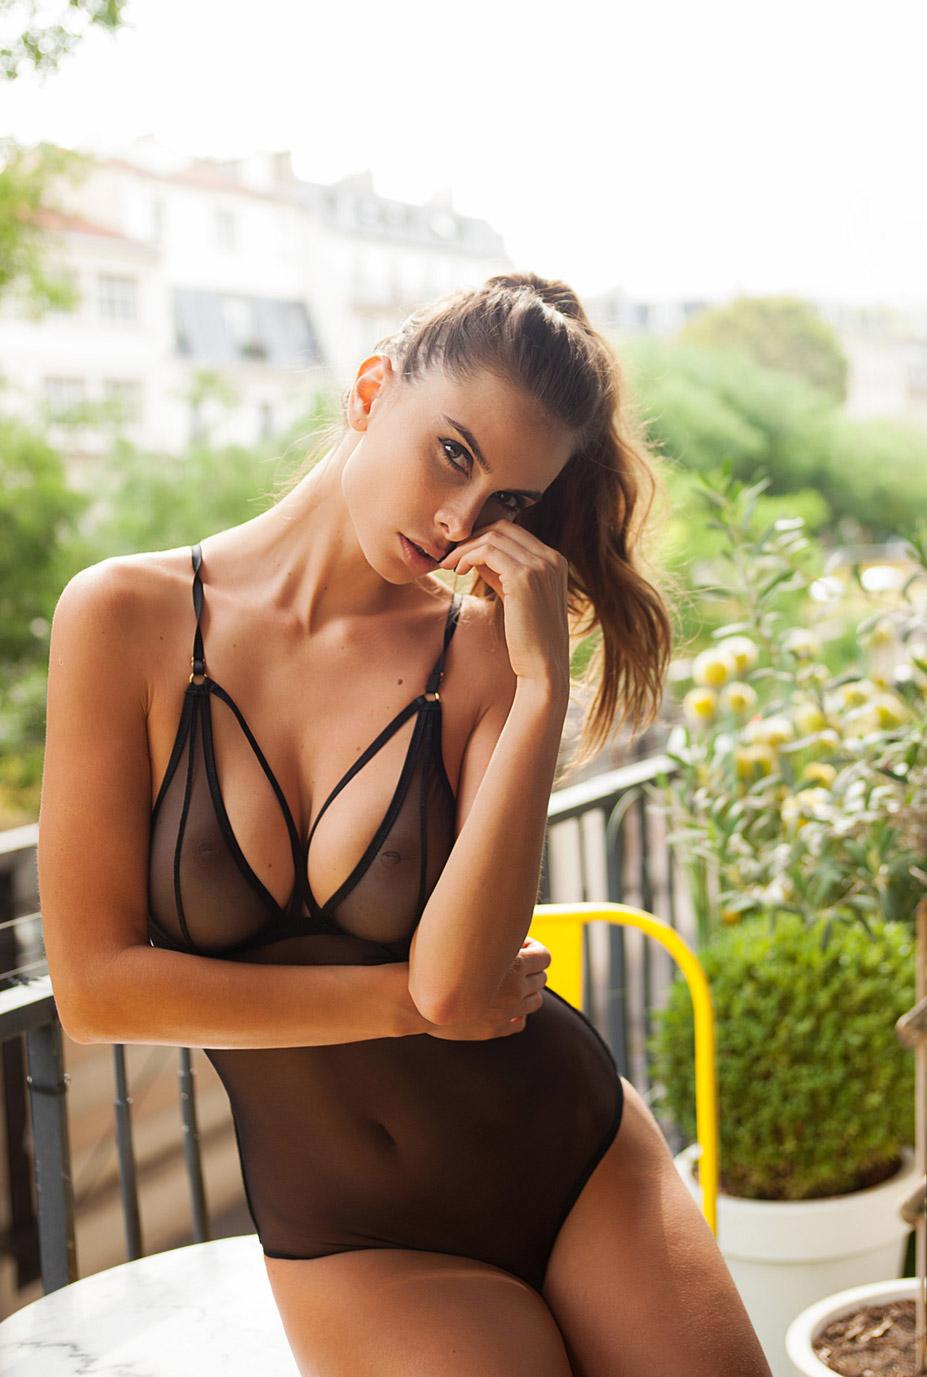 Александра Зимни / Alexandra Zimny nude by Celine Andrea - Yume Magazine